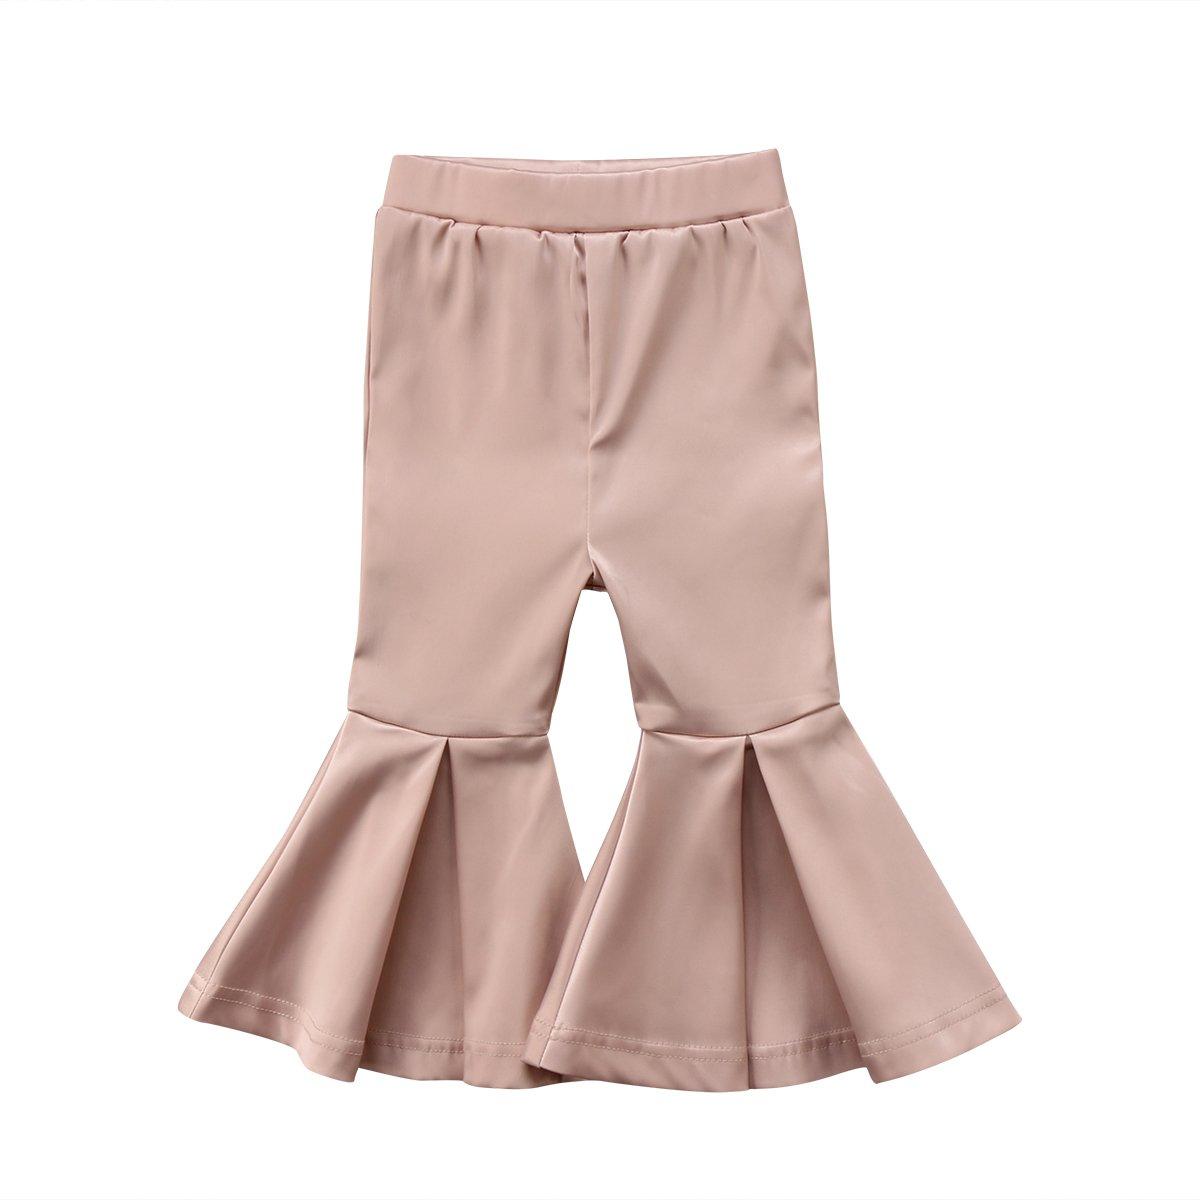 30ad5fa04bc80 Galleon - Newborn Baby Girls Kids Boho Floral Bell Bottom Flare Leggings  Trousers Pants (Glod, 2-3 T)